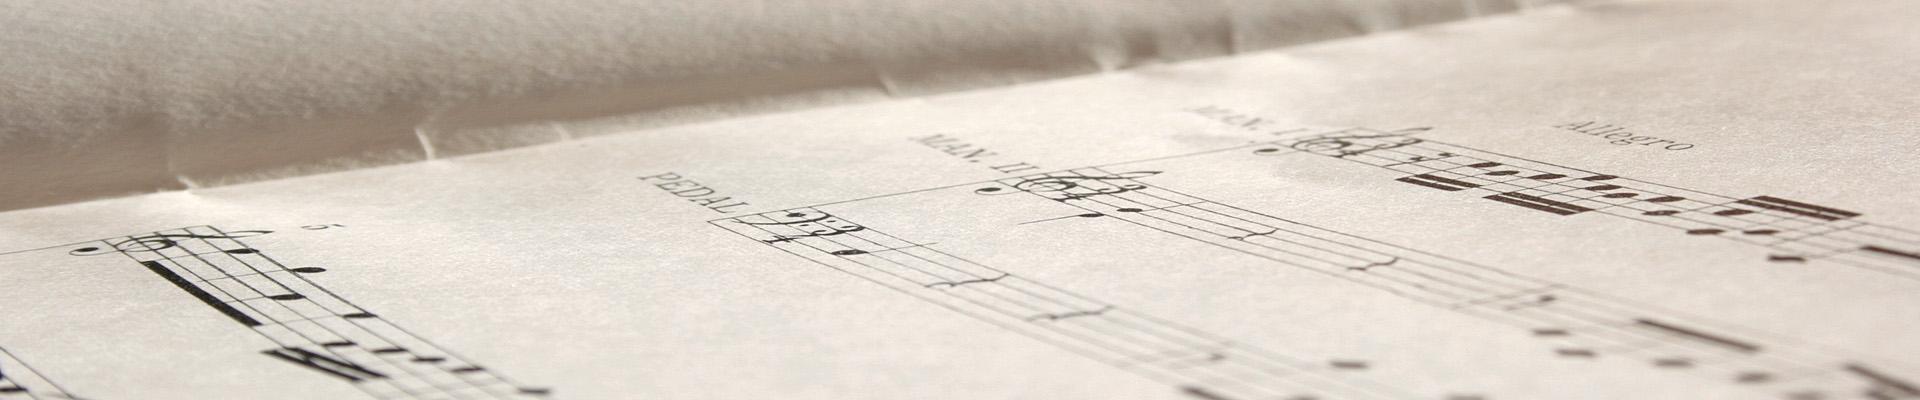 musiknoten-stephan-pieger-muenchen-oboe-2018-2